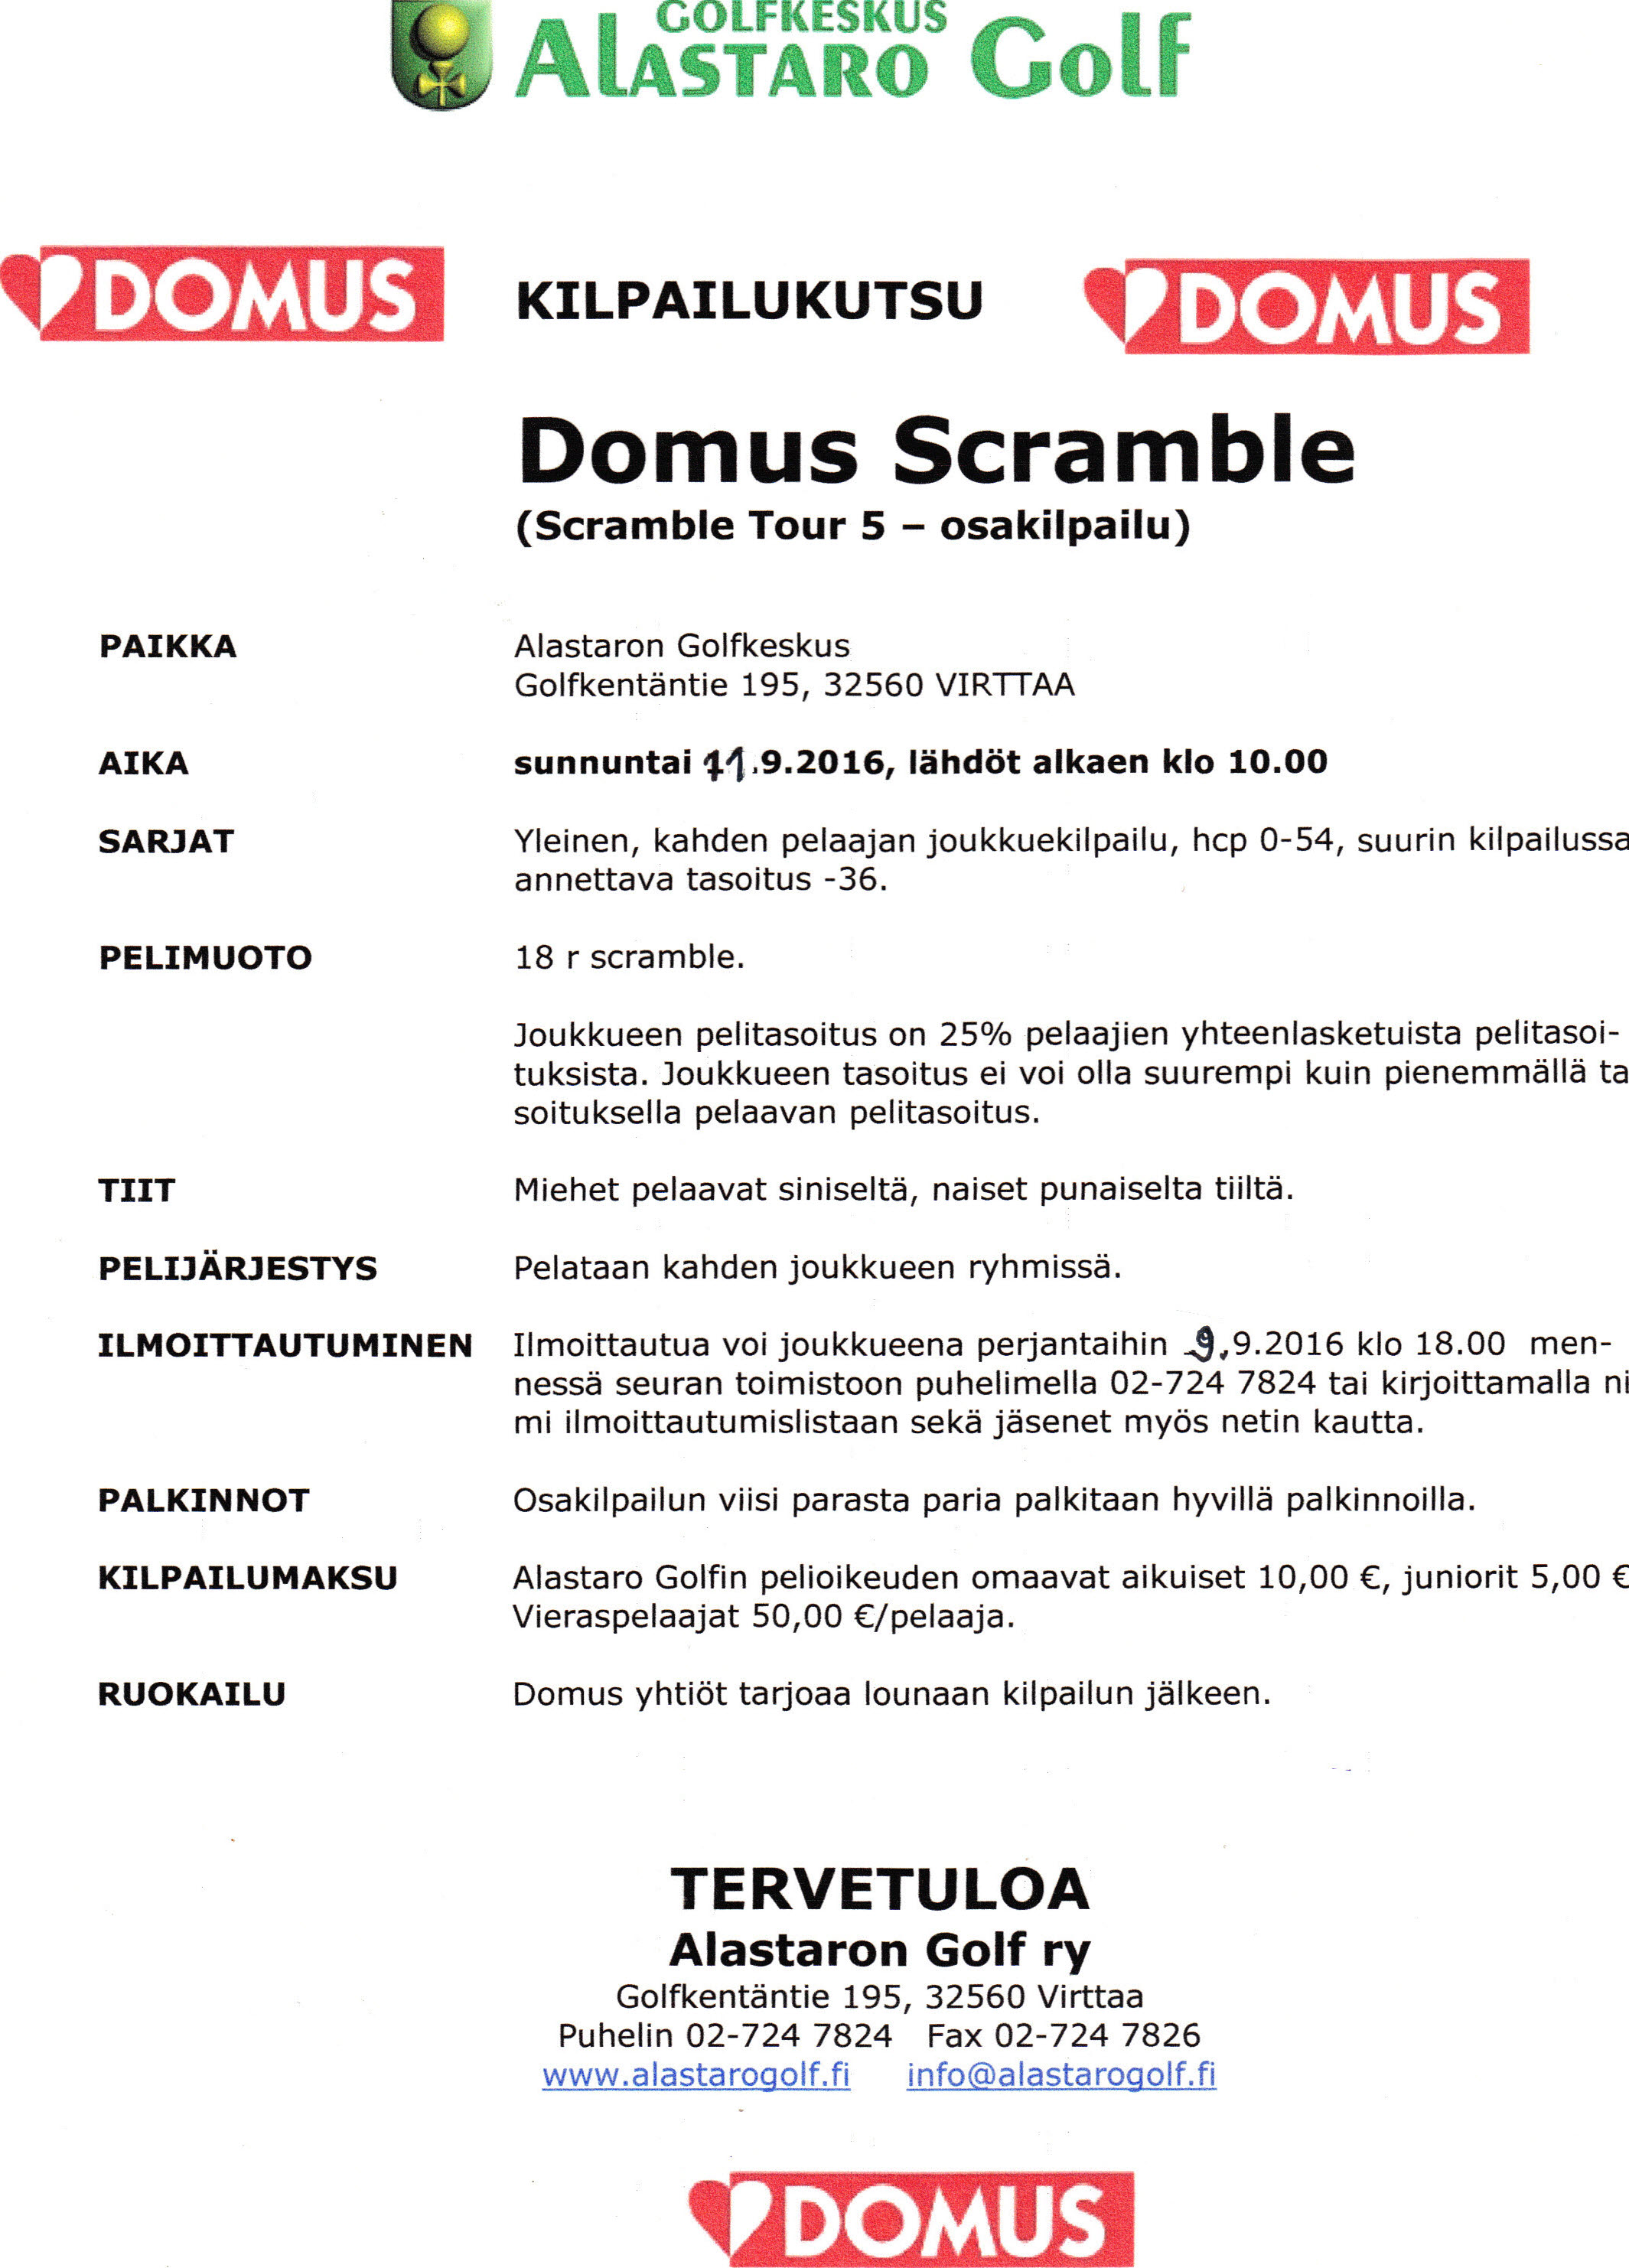 Domus Scramble Kilpailukutsu (Scramble Tourin 5 osakilpailu)  Alastaro Golf